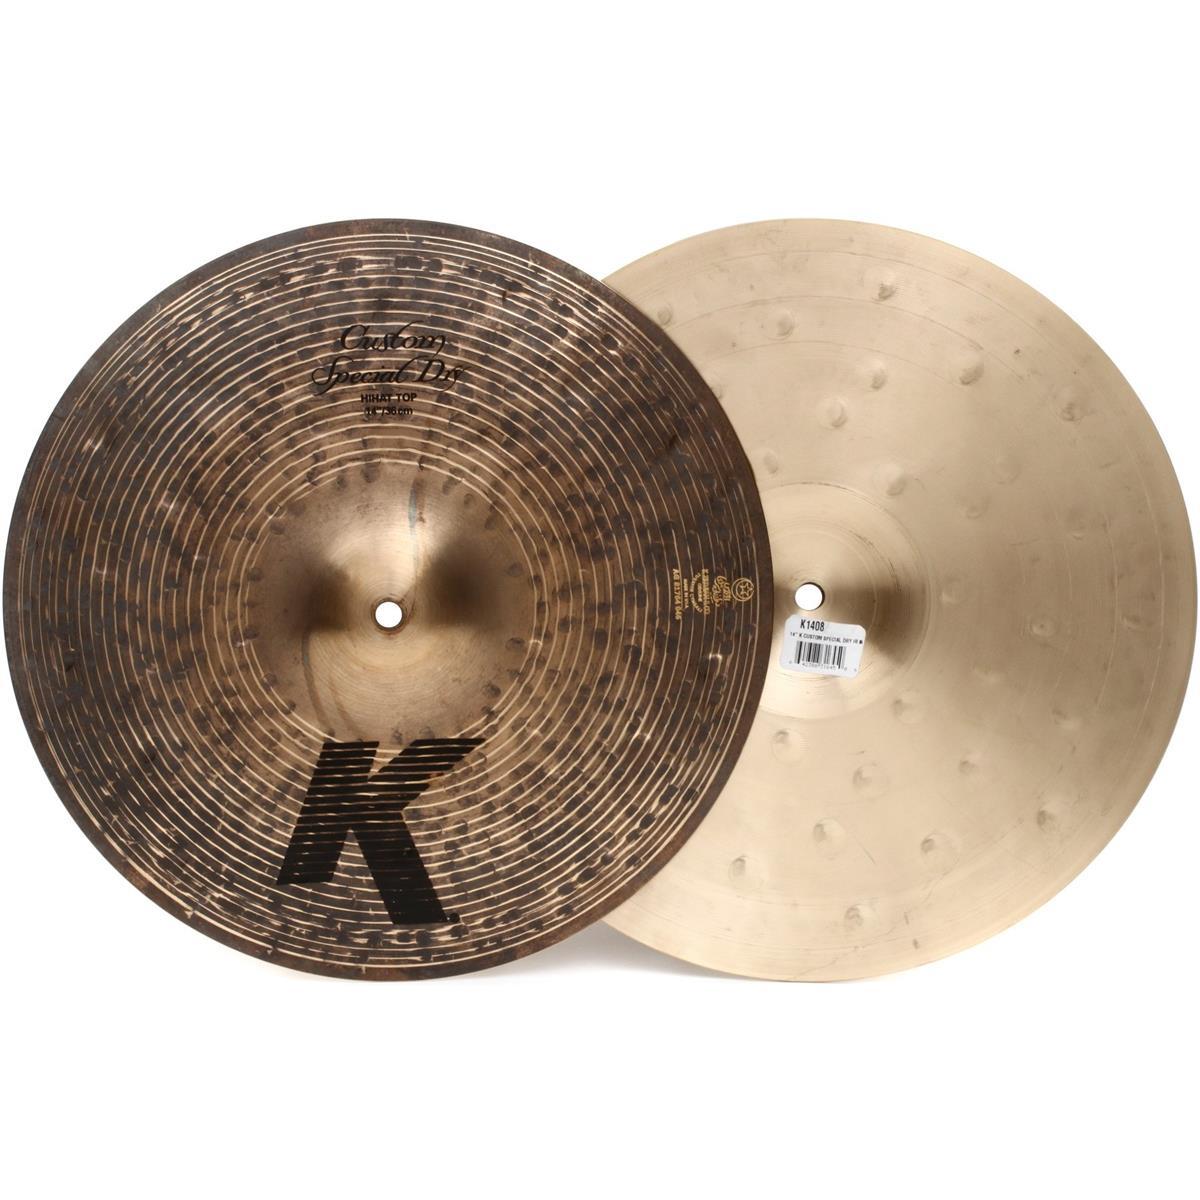 Zildjian-14-K-Custom-Special-Dry-Hi-hat-cm-36-sku-9022057213071